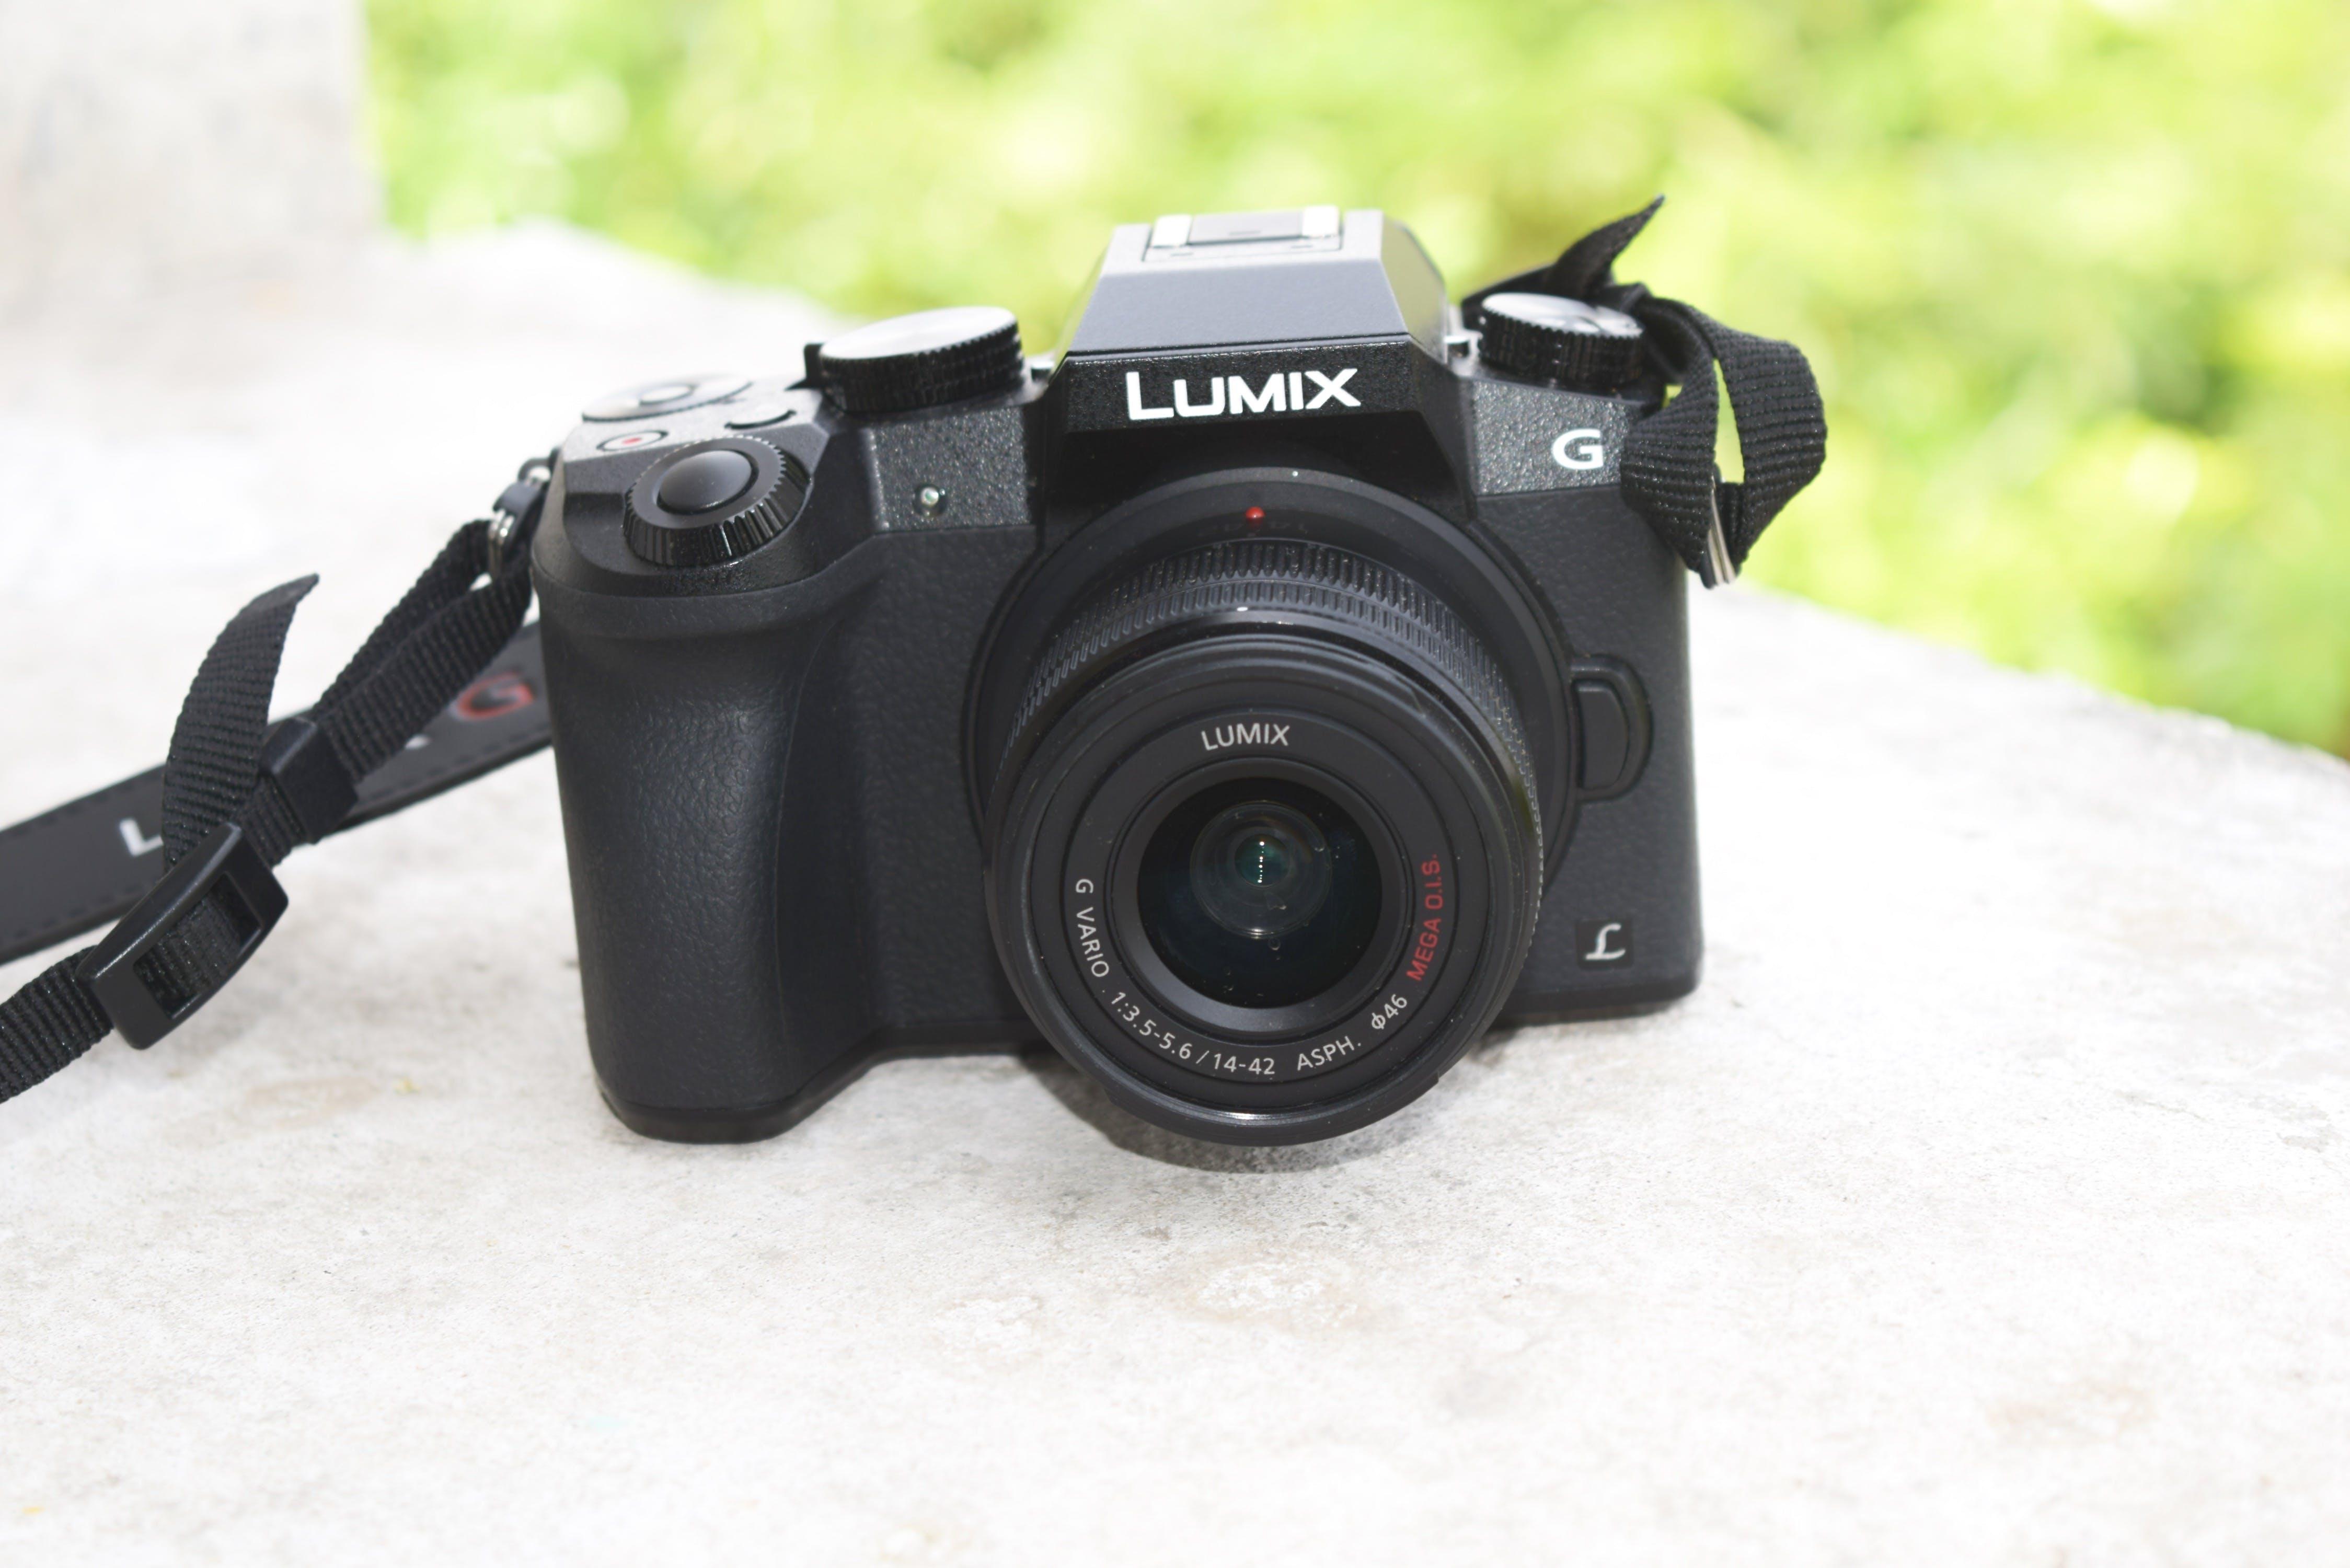 Free stock photo of camera, camera lens, digital camera, dslr